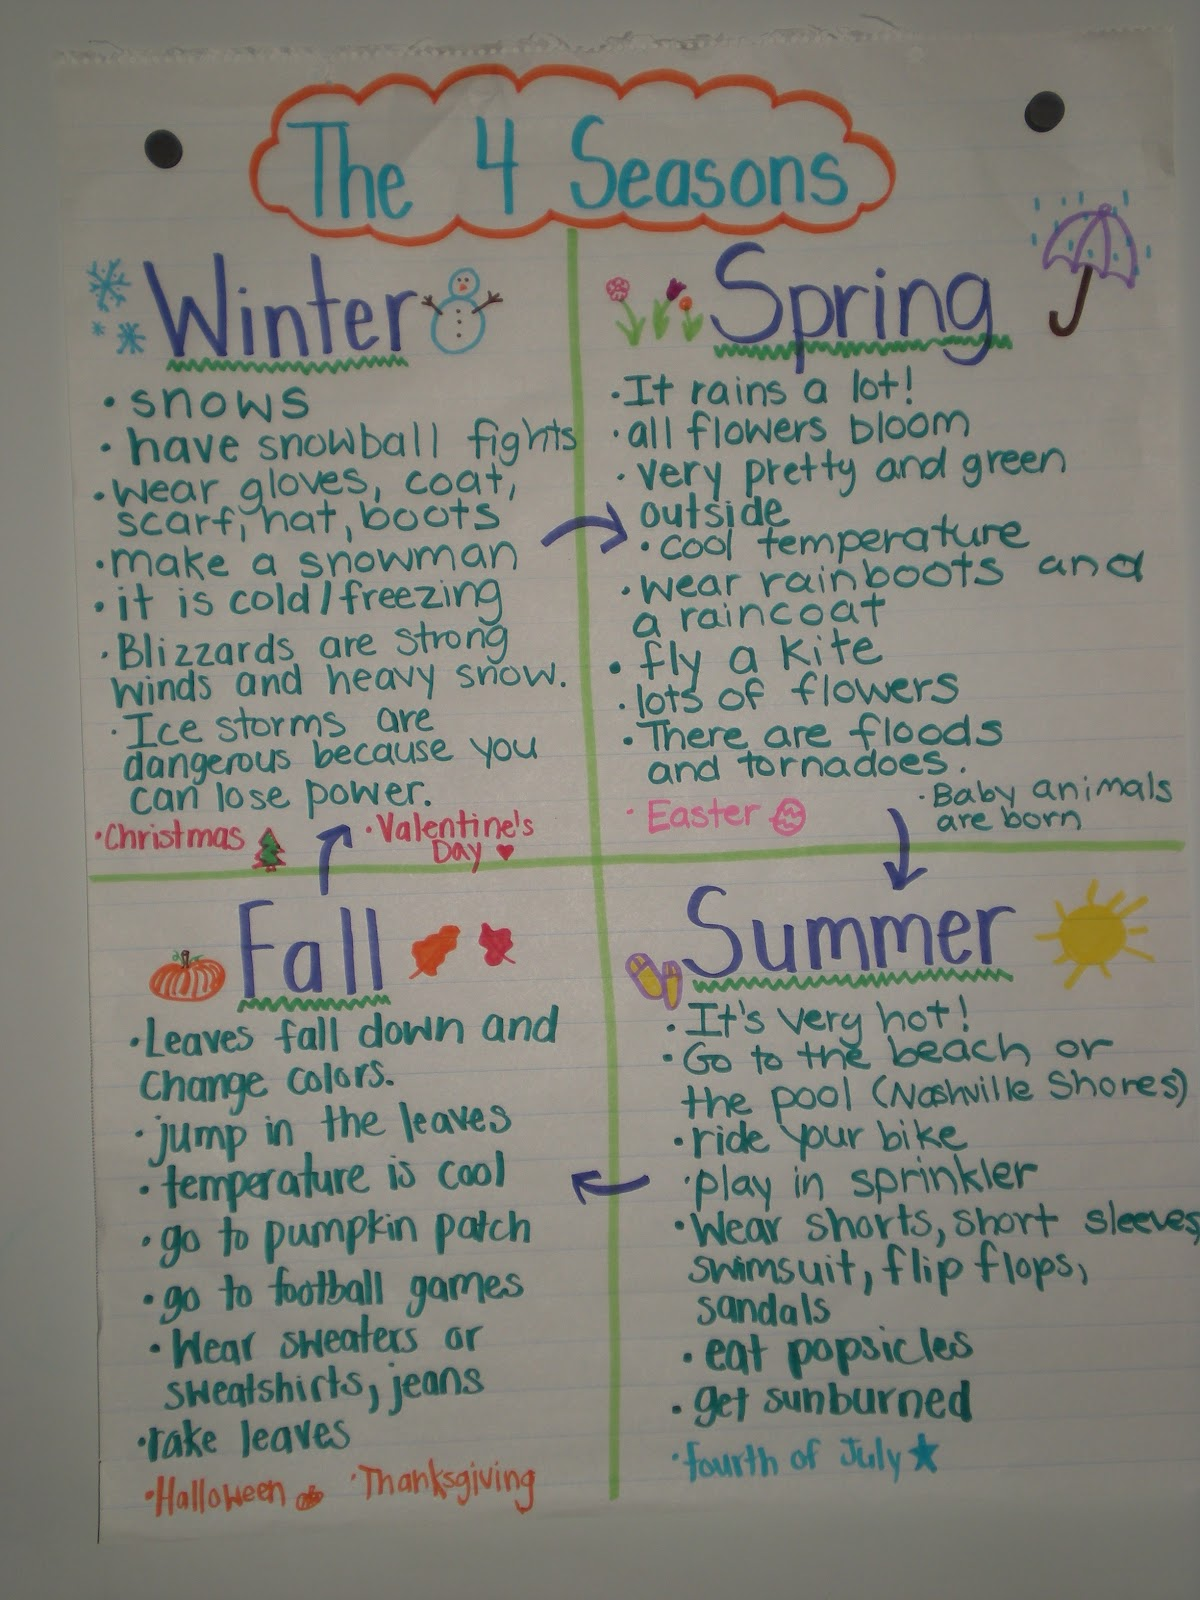 The Good Life The Four Seasons